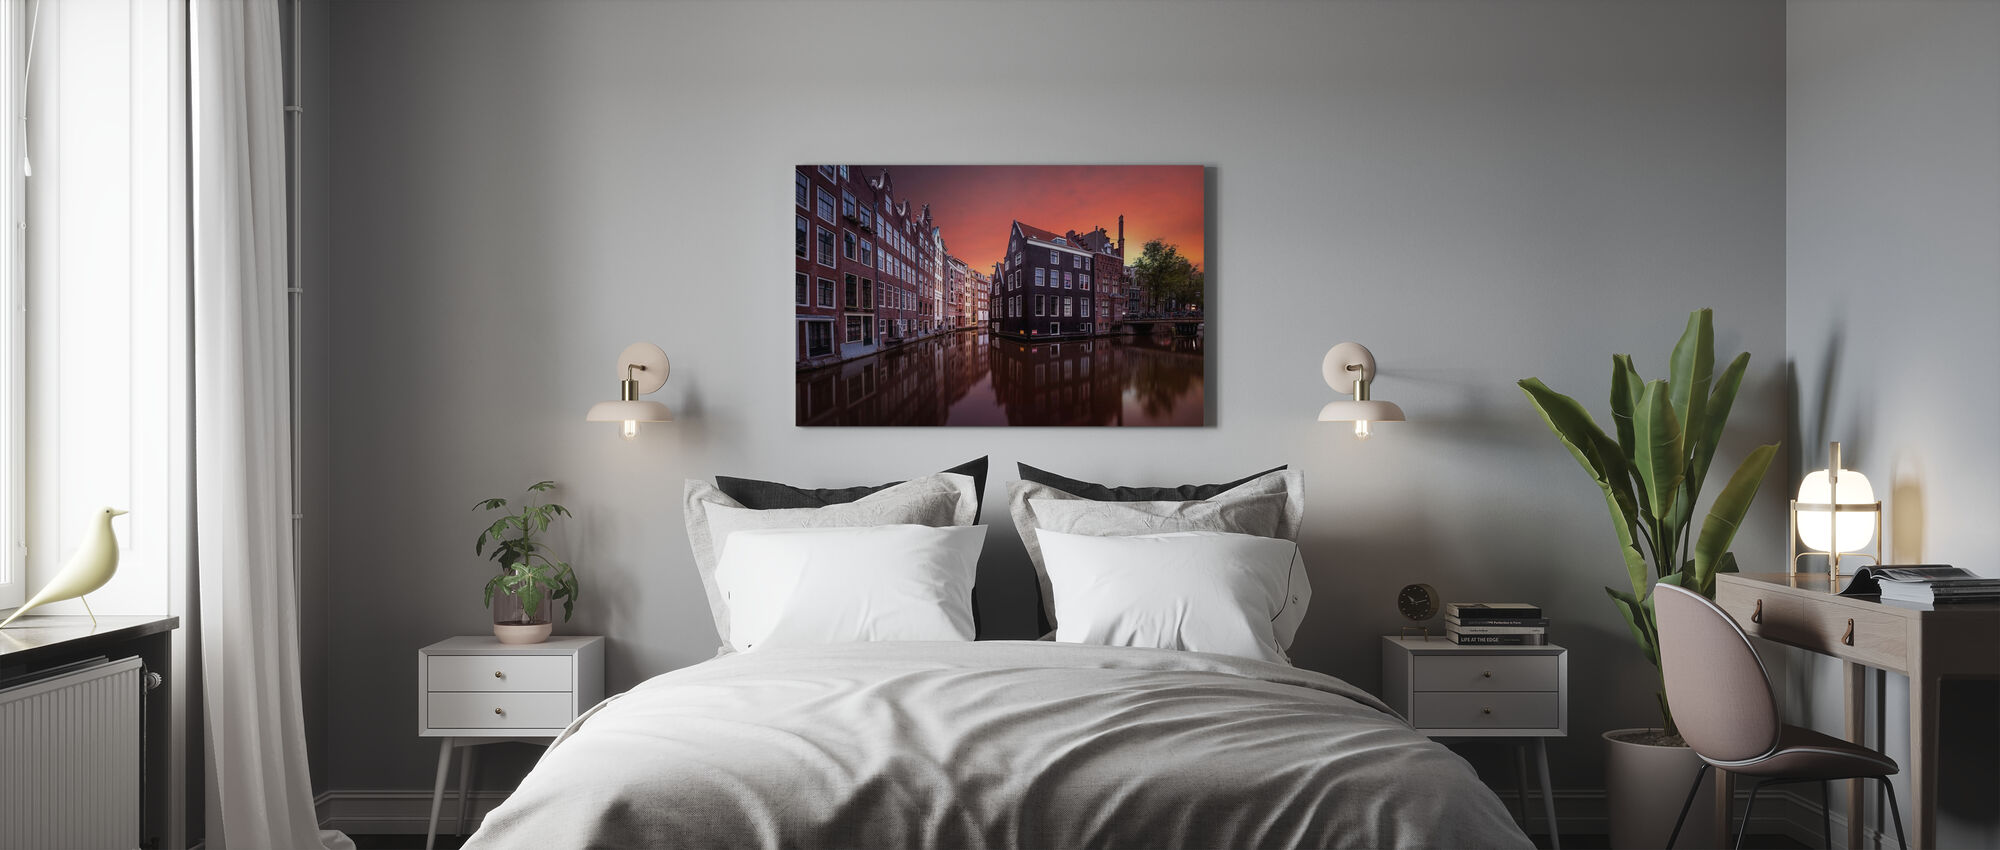 Amsterdam Morgendämmerung - Leinwandbild - Schlafzimmer